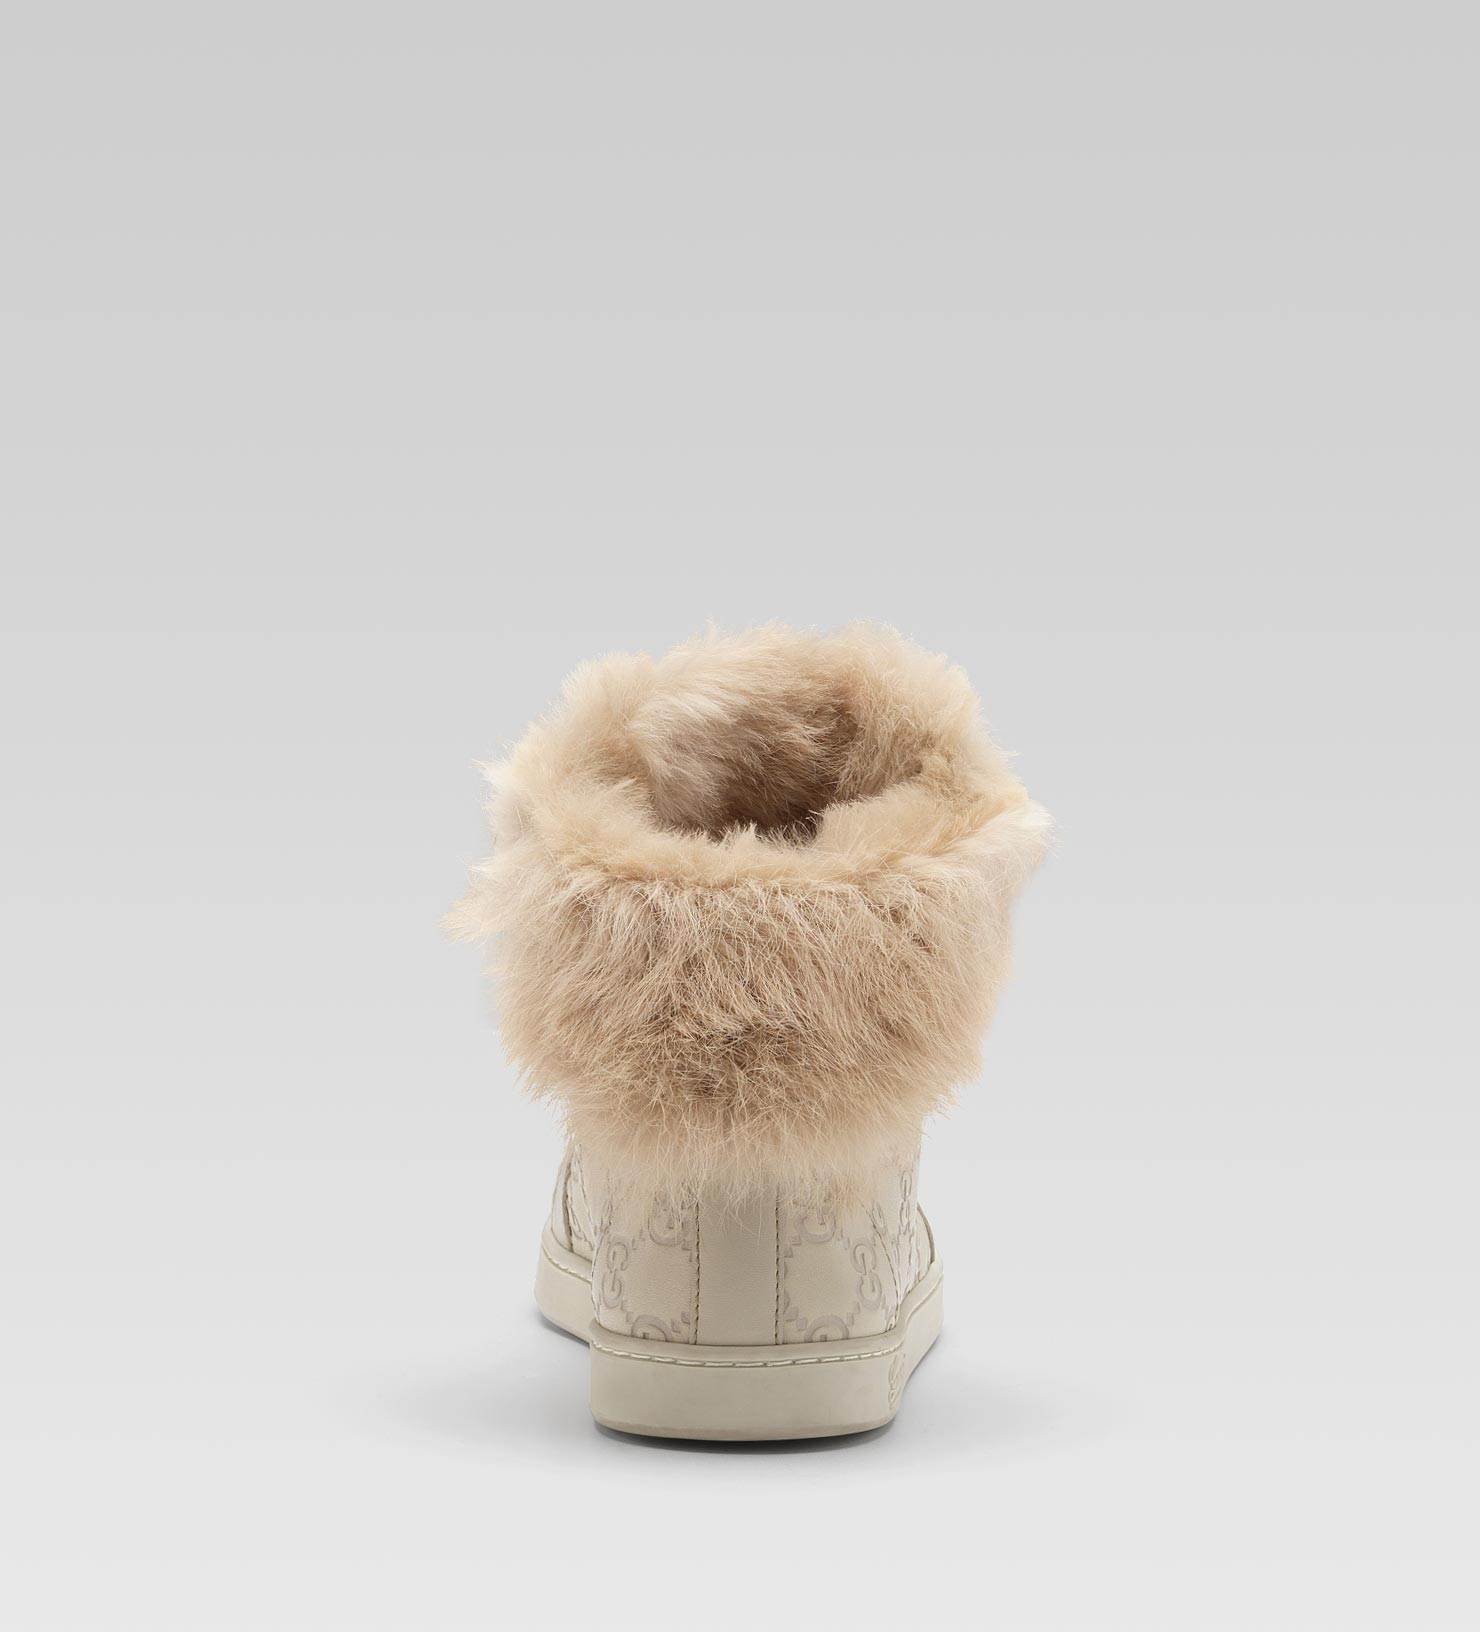 Lyst - Gucci Coda Fur-trim Hi-top Interlocking G Sneaker in Gray 7511529dd3